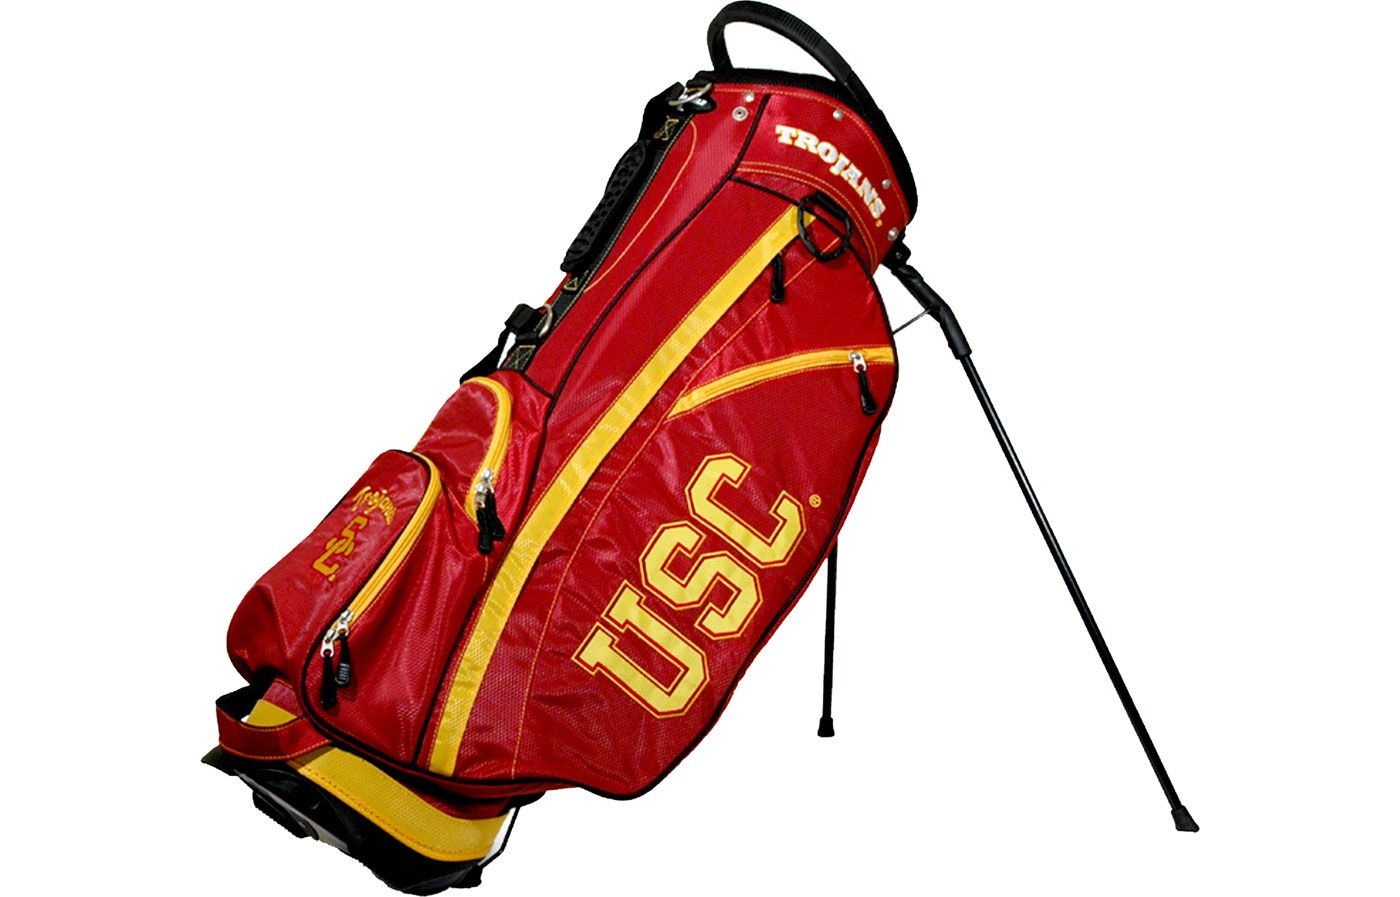 Team Golf Fairway USC Trojans Stand Bag